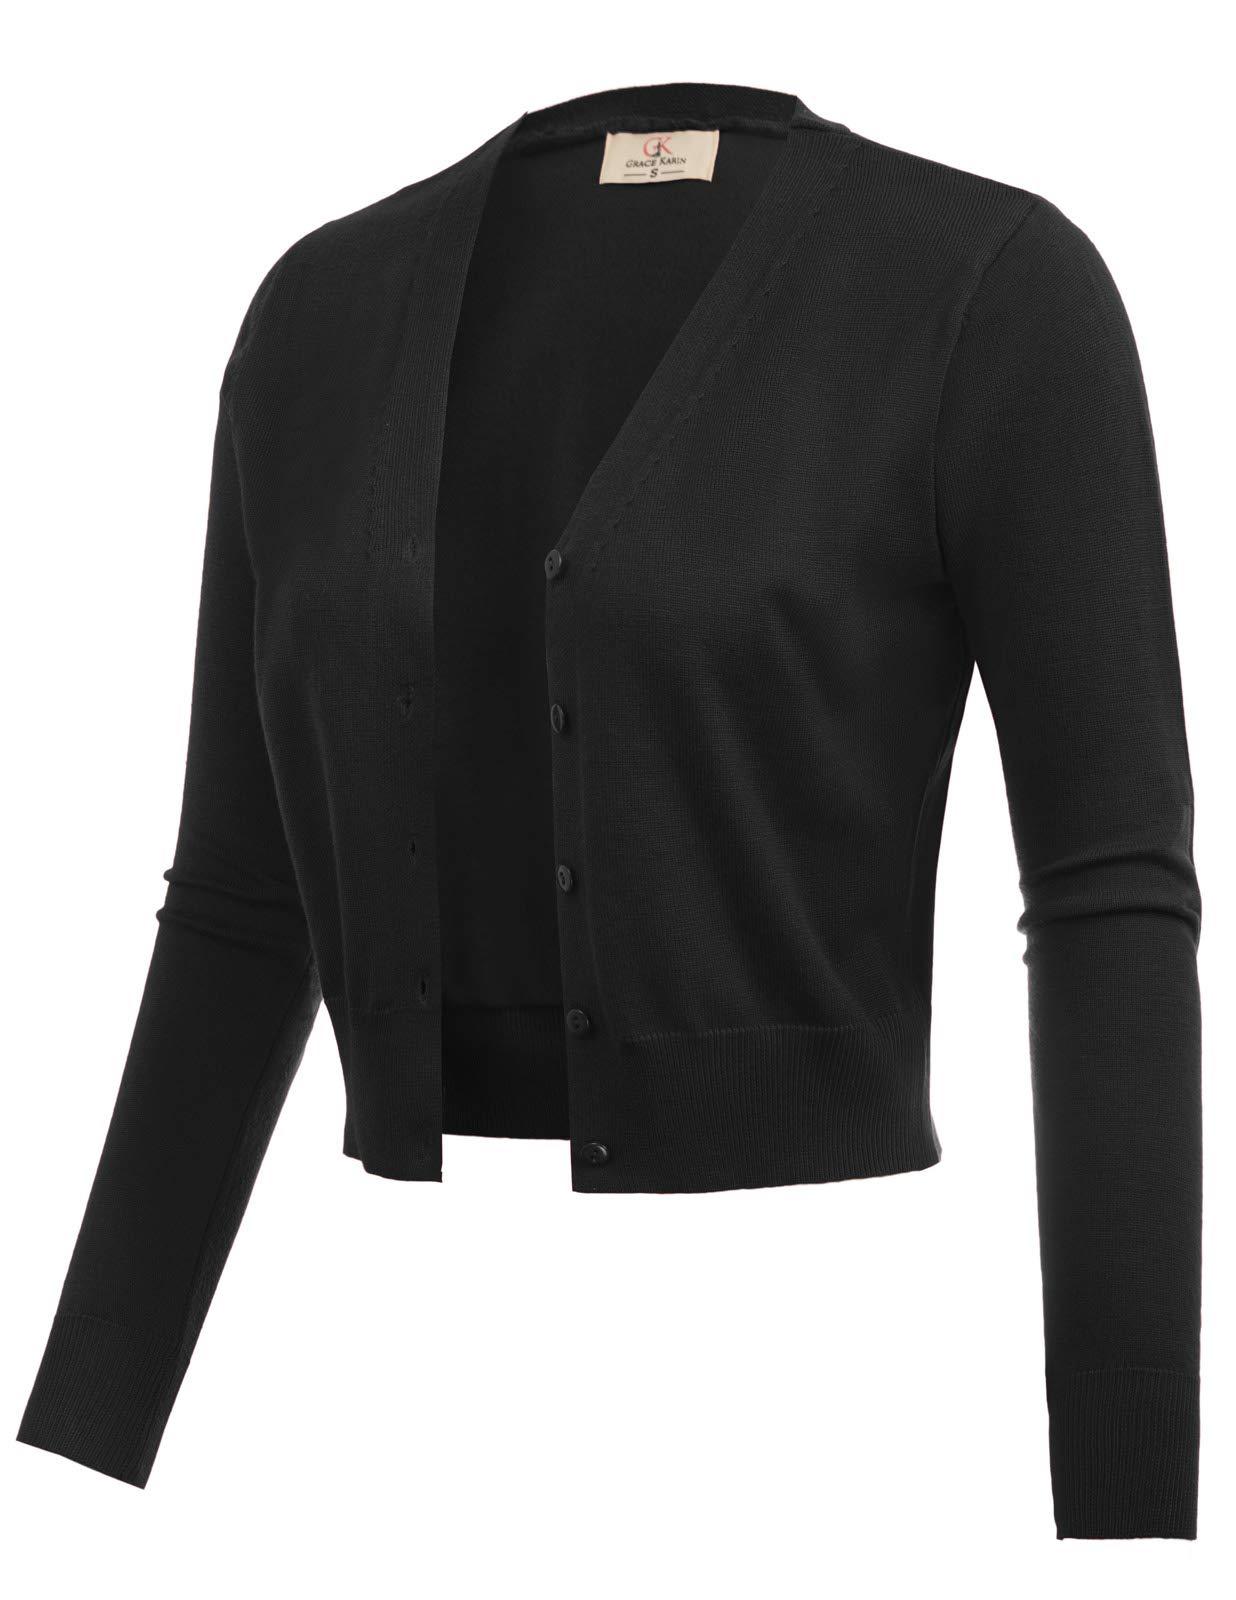 Woven Long Sleeve Bolero Shrug Jacket Cardigan Black Size L CL2000-1